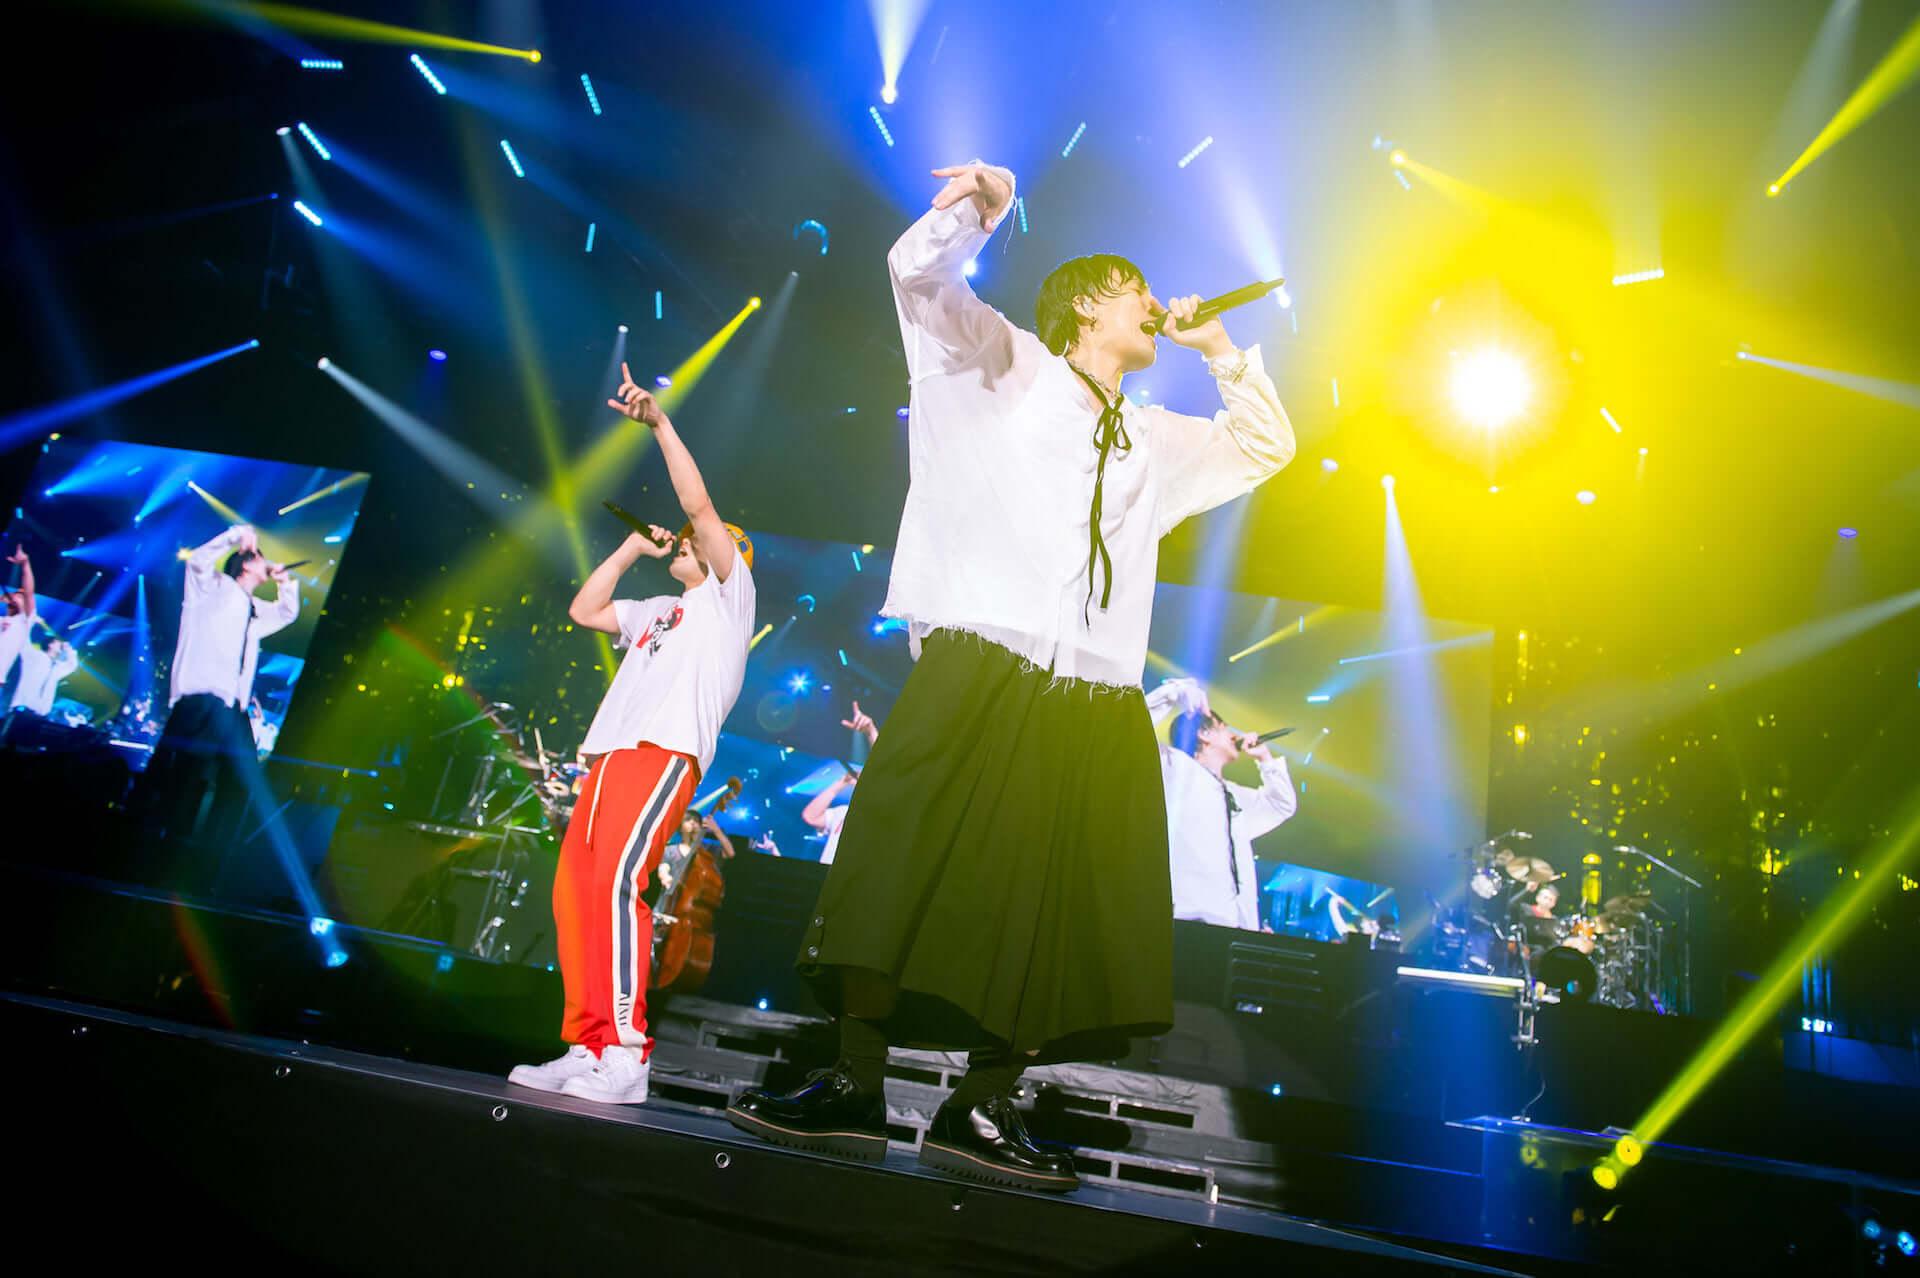 RADWIMPS横浜アリーナ公演のライブ写真が公開!<ANTI ANTI GENERATION TOUR 2019>レポート music190830_radwimps_live_24-1920x1278